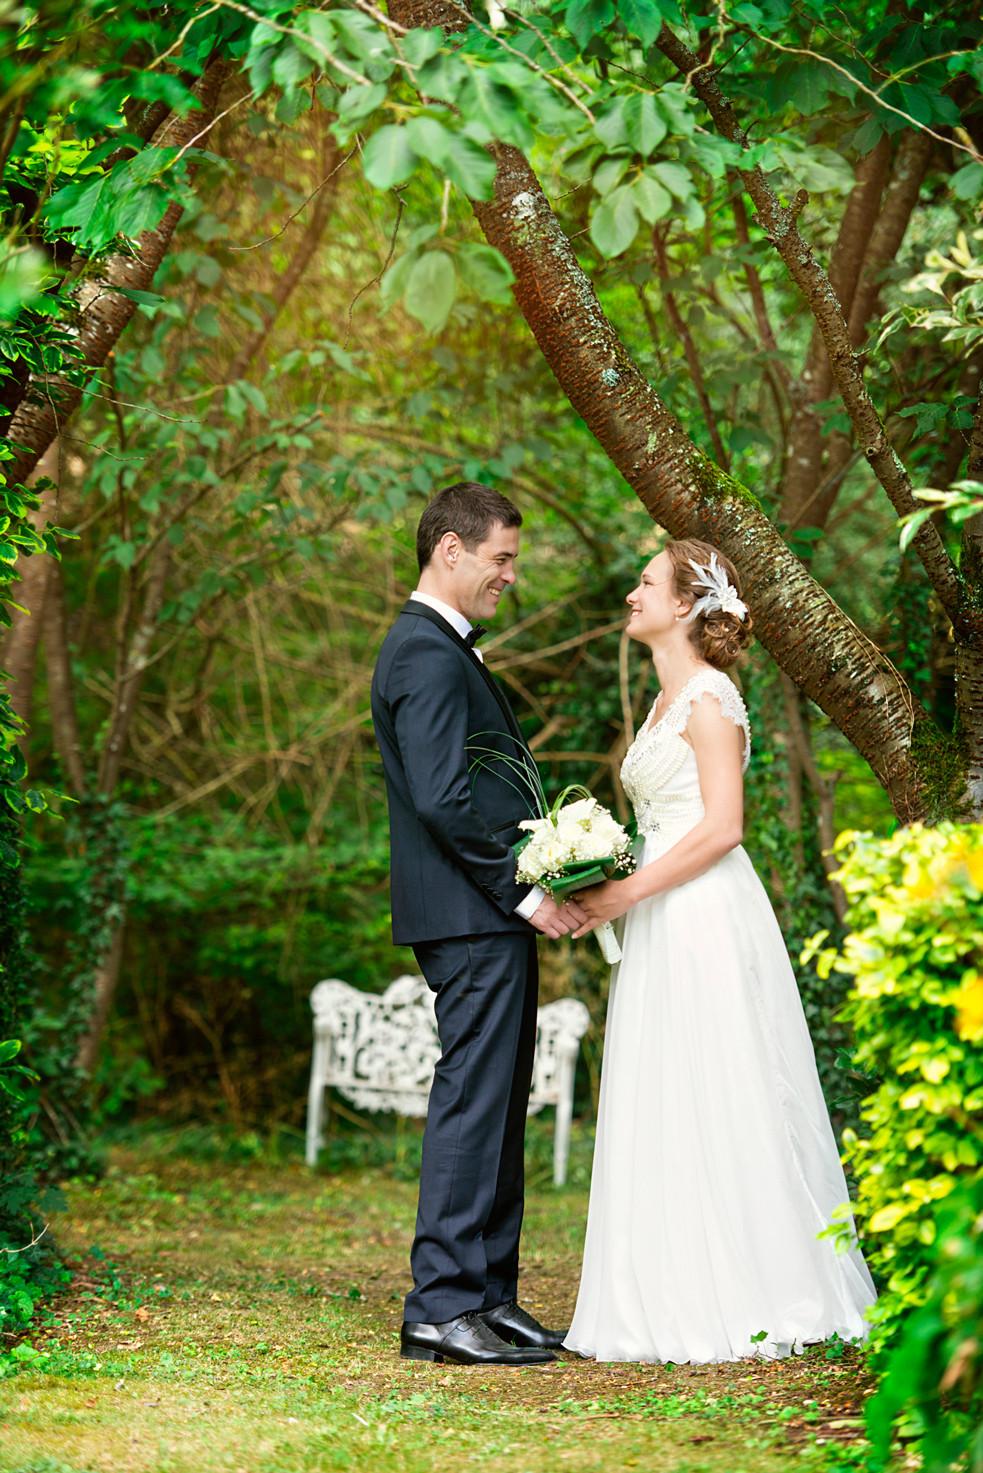 photographe de mariage - 95 - val d'oise - magny en vexin - marine